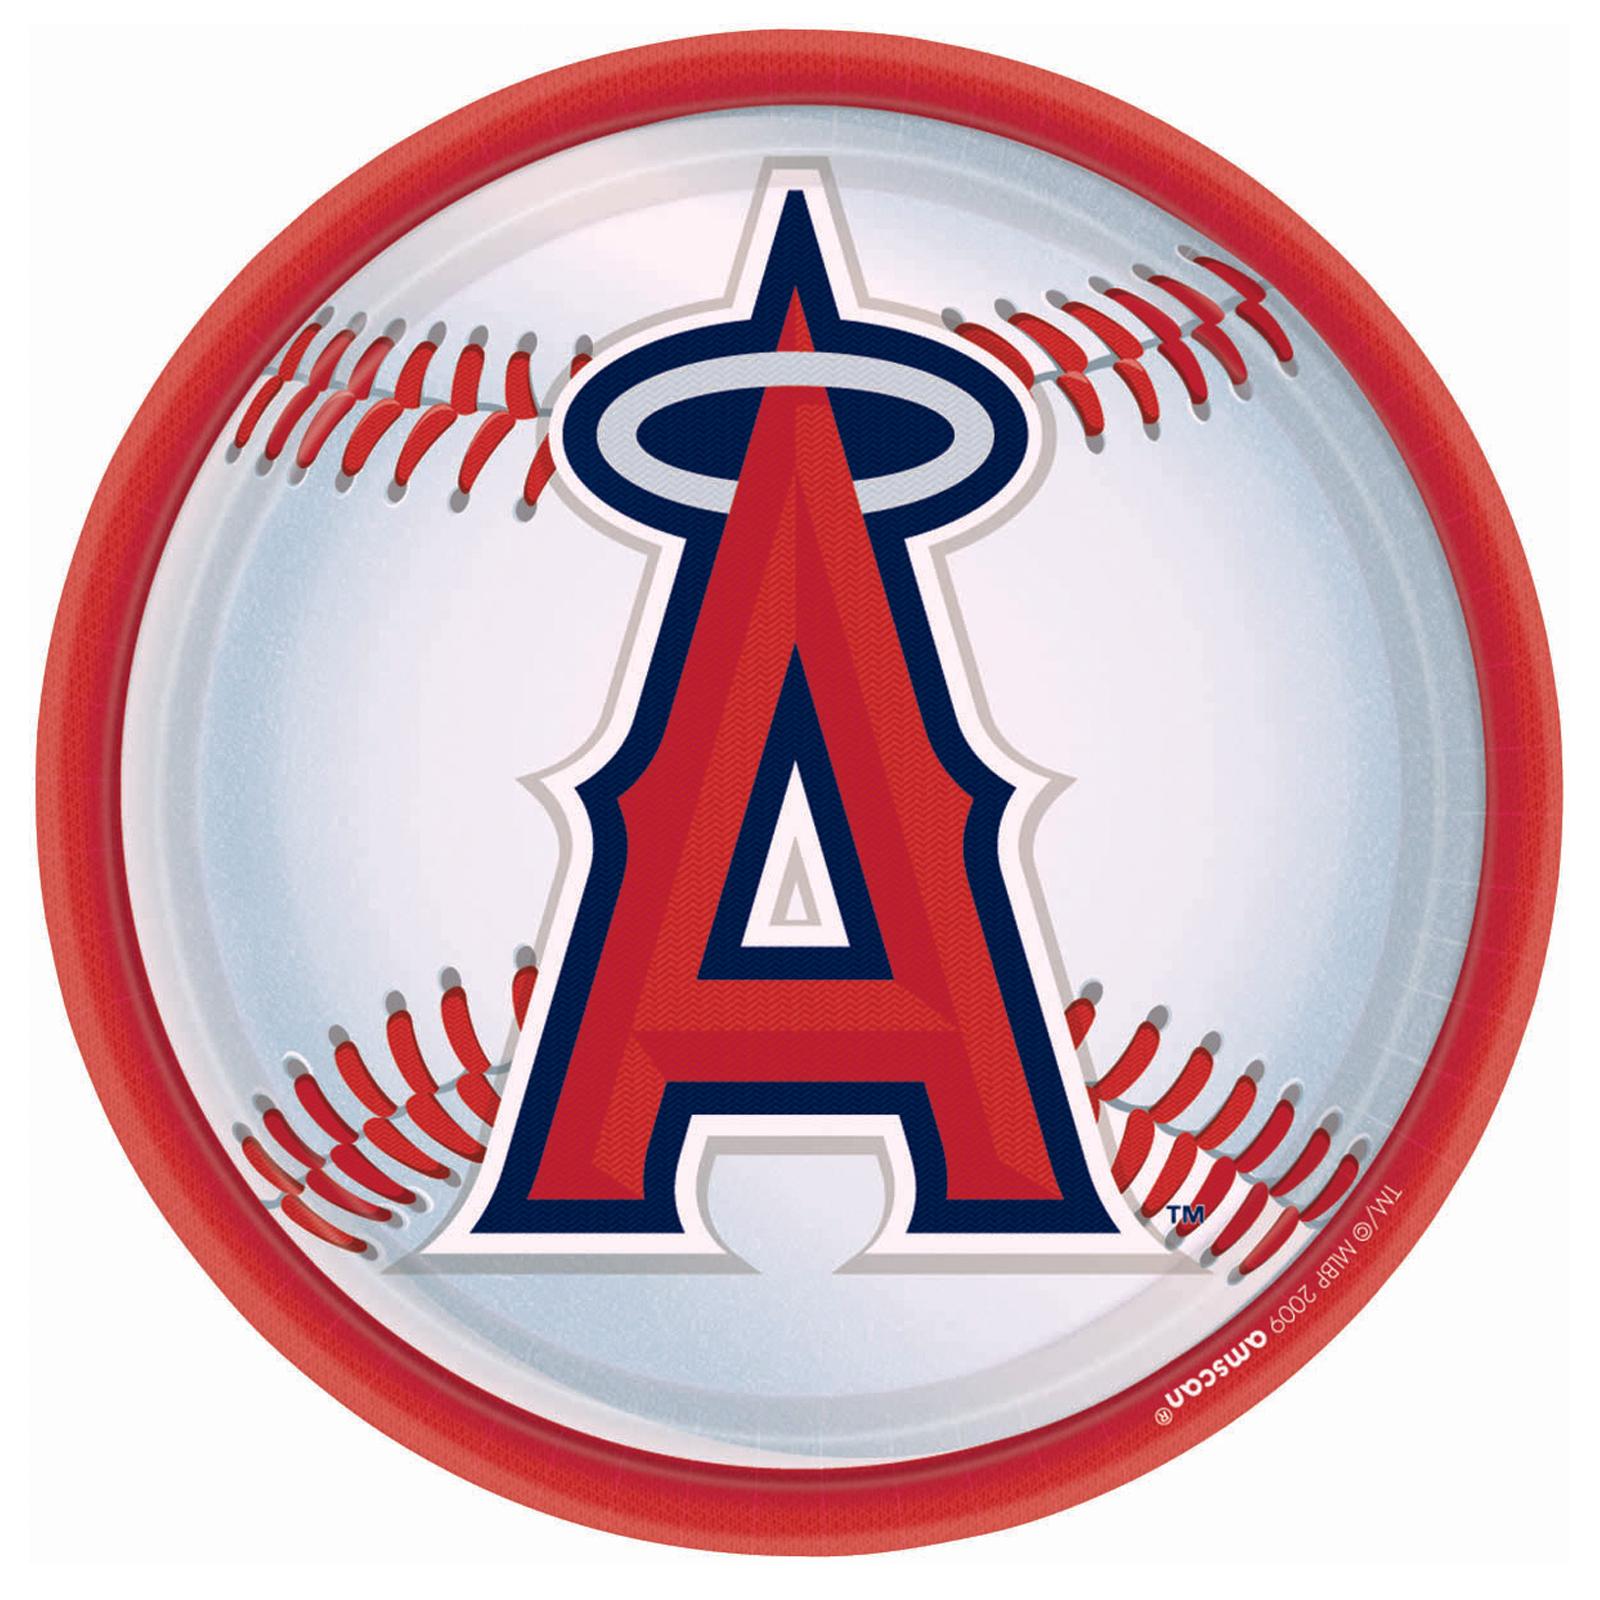 Free Angels Baseball, Download Free Clip Art, Free Clip Art.